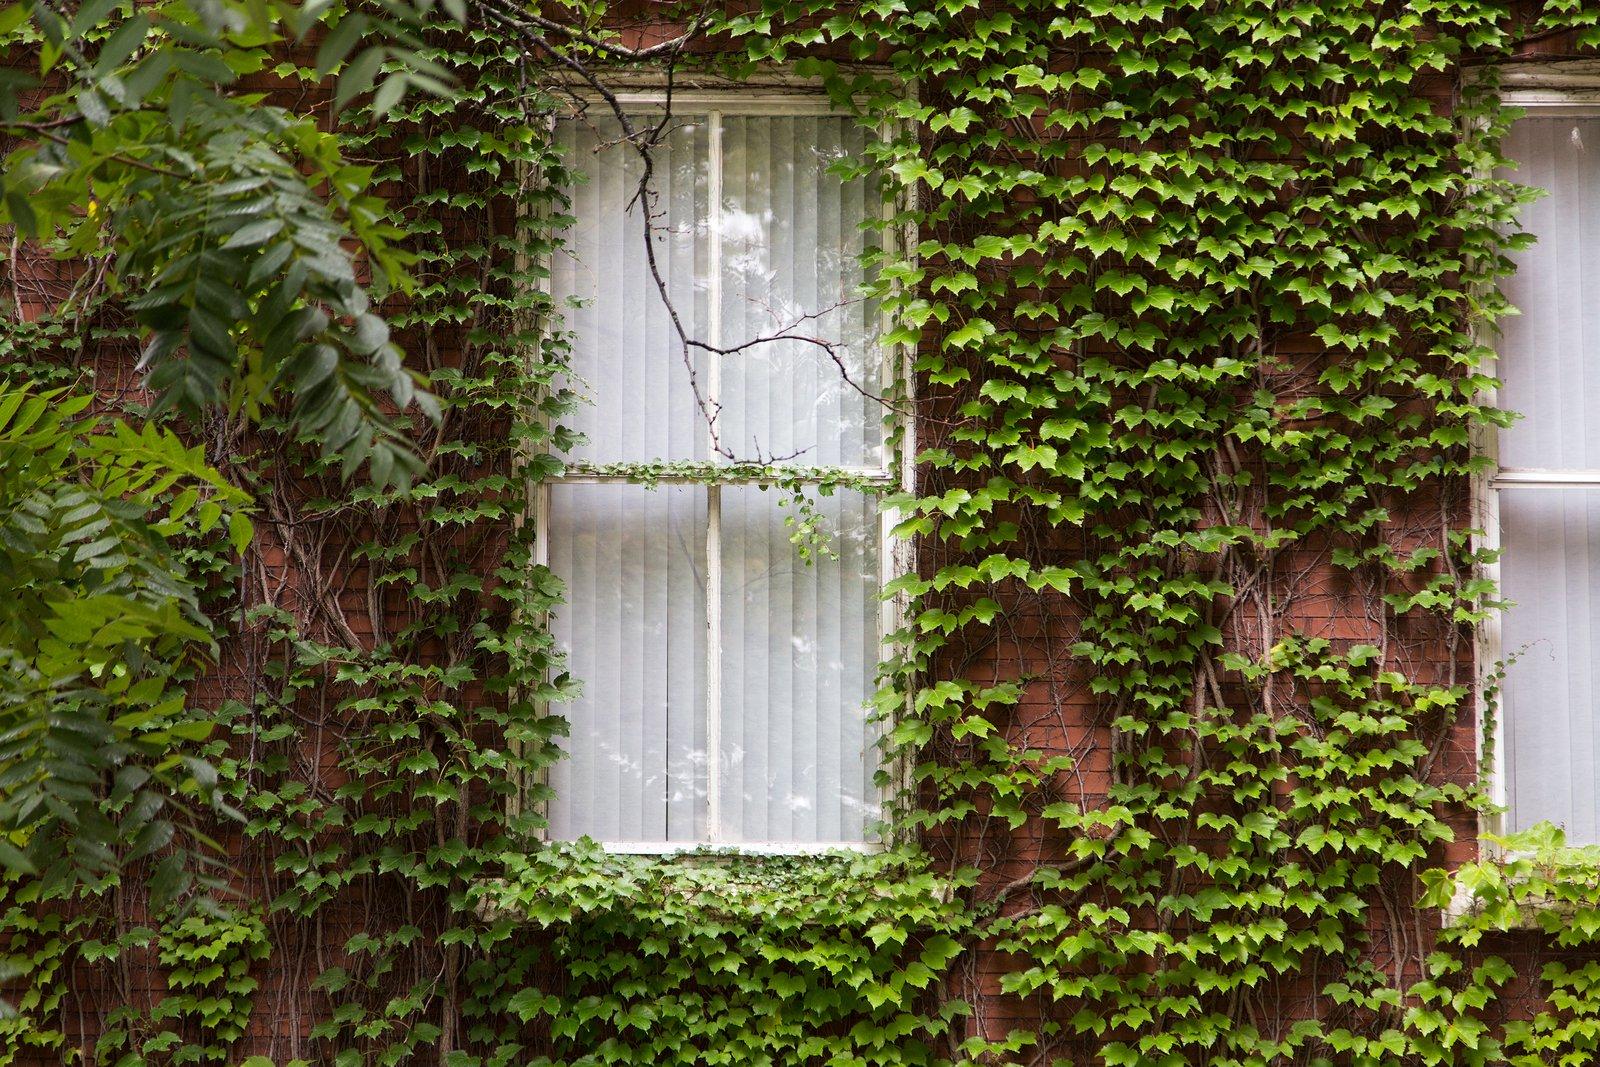 ivygrowingonbrick